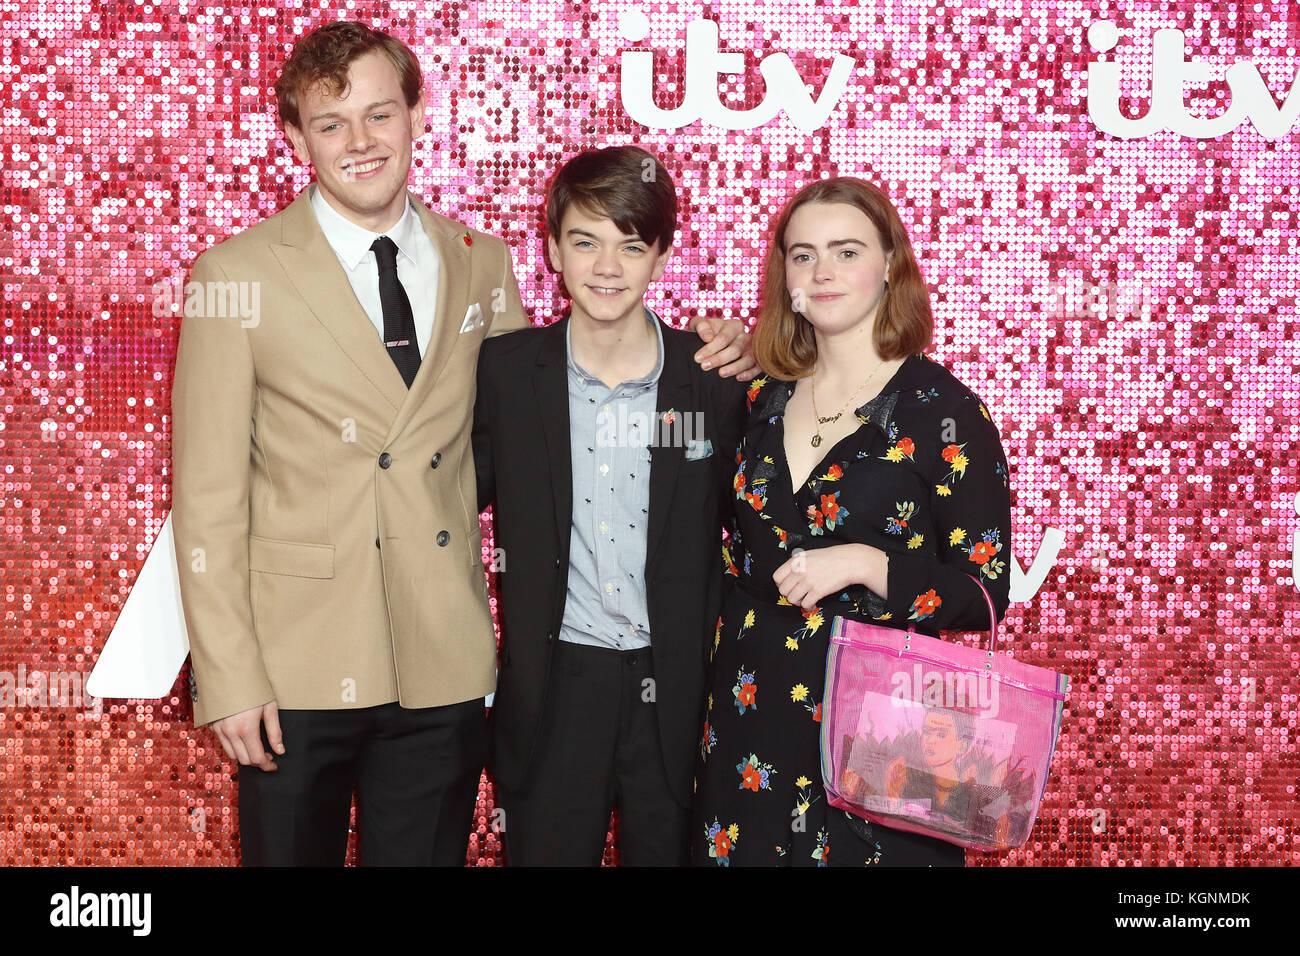 London, UK. 9th November, 2017. The Durrrells, Callum Woodhouse, Milo Parker, Daisy Waterstone, ITV GALA, London - Stock Image